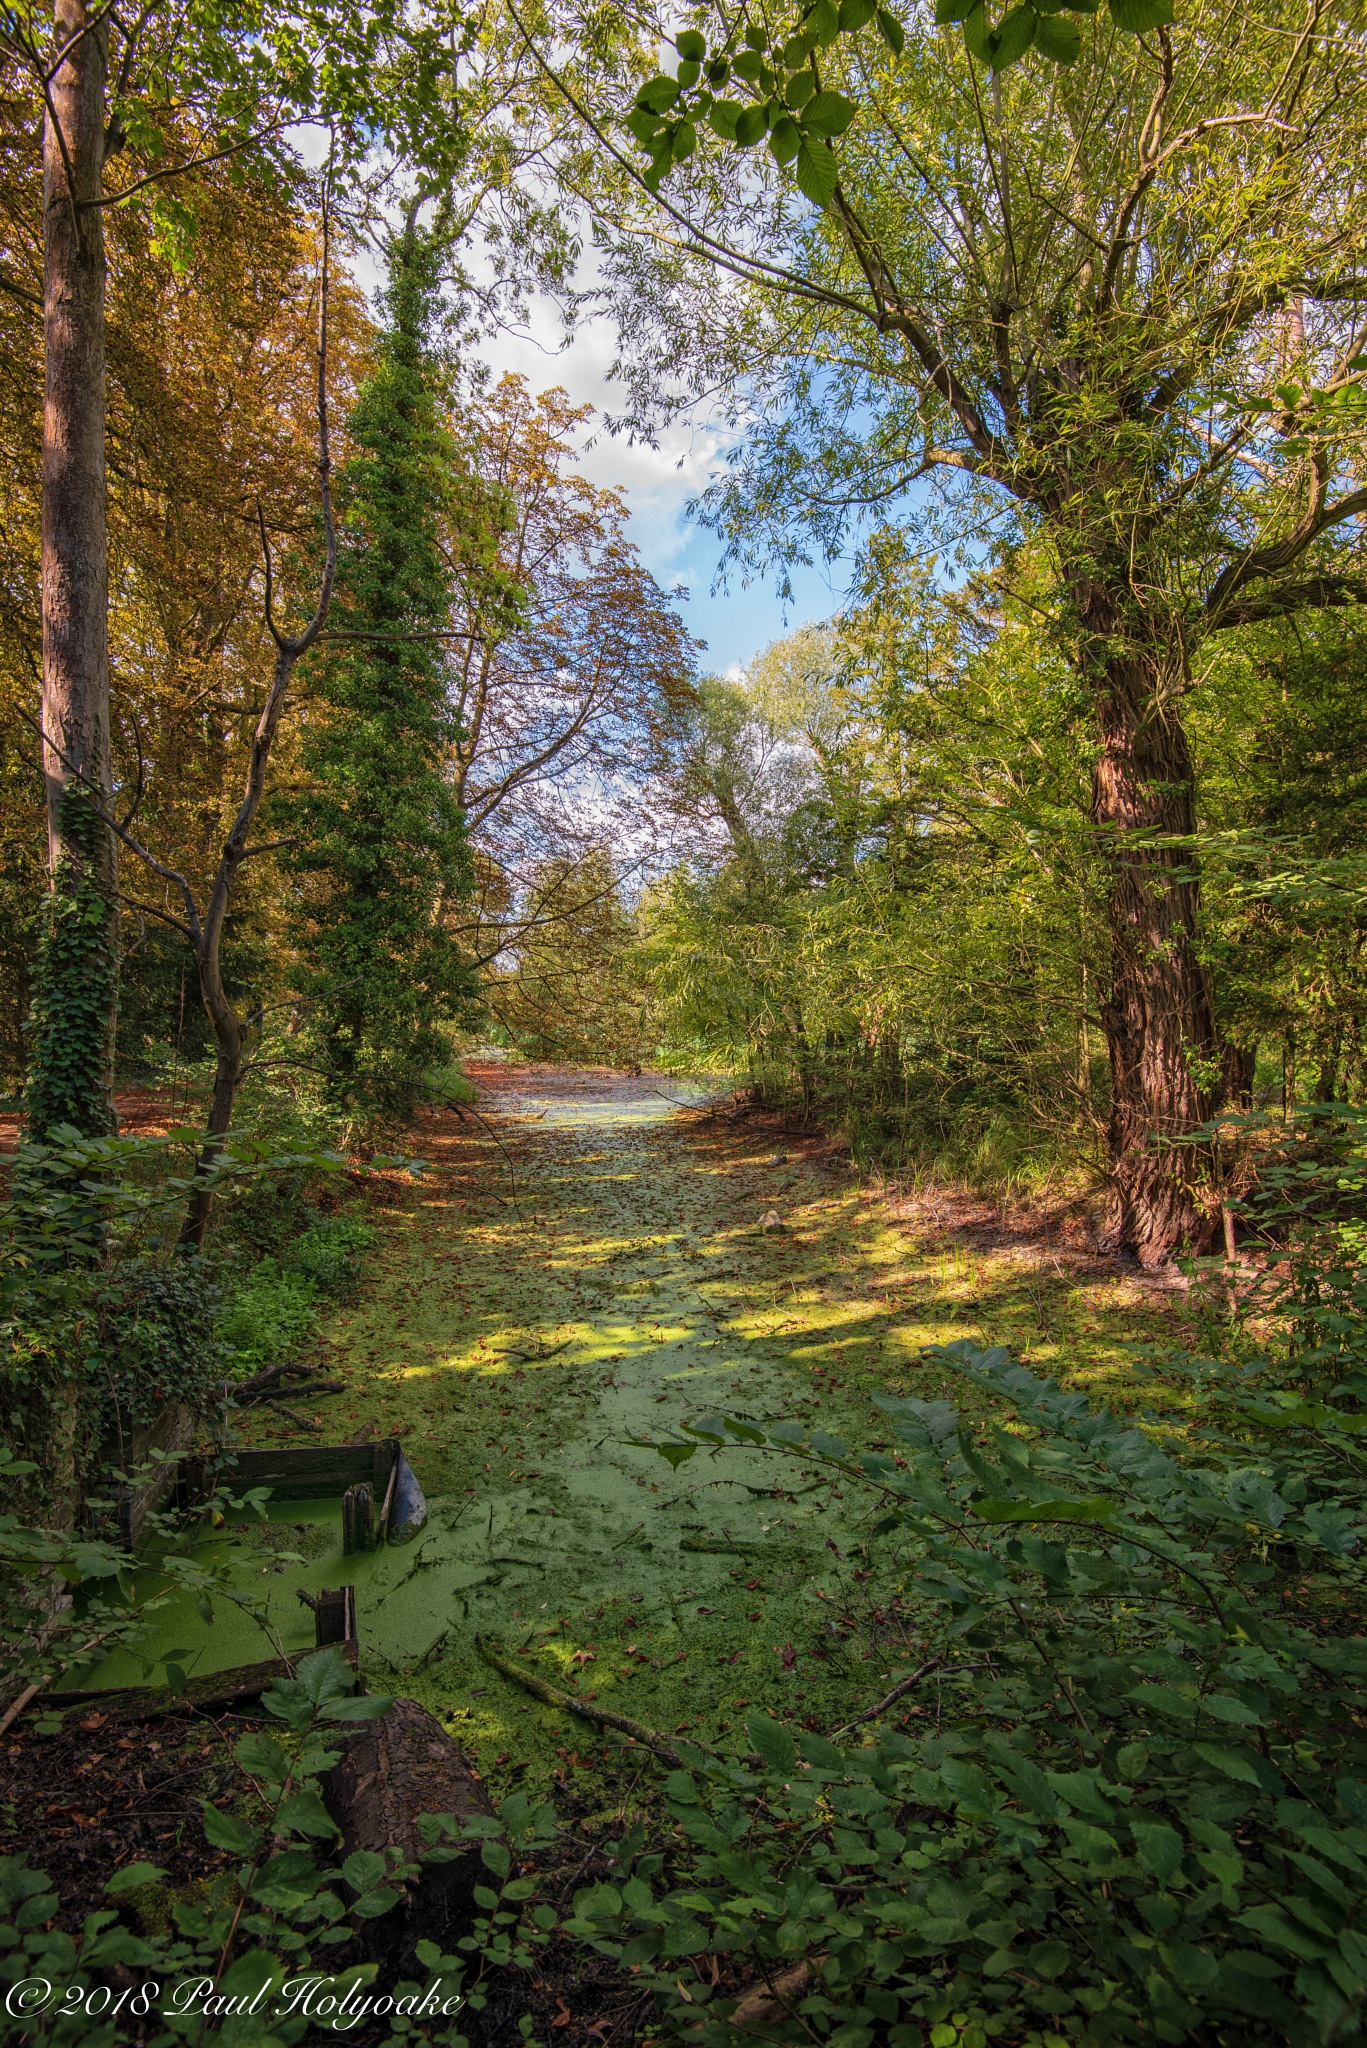 Algae Covered Brook by Photon